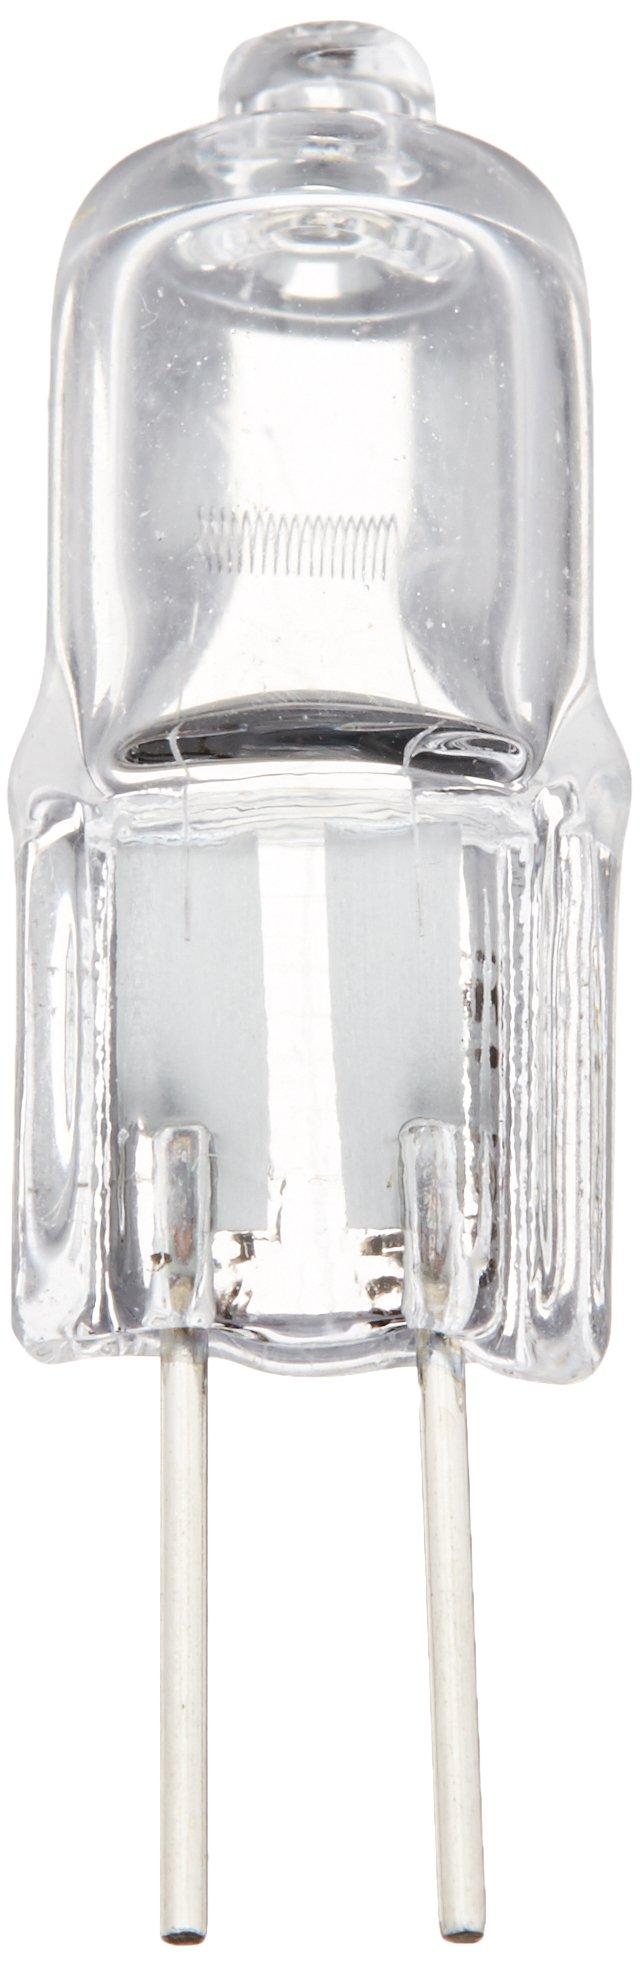 CBconcept 10XG412V10W G4 JC Halogen Light Bulb,10-Watt,12-Volt, 10 Bulbs